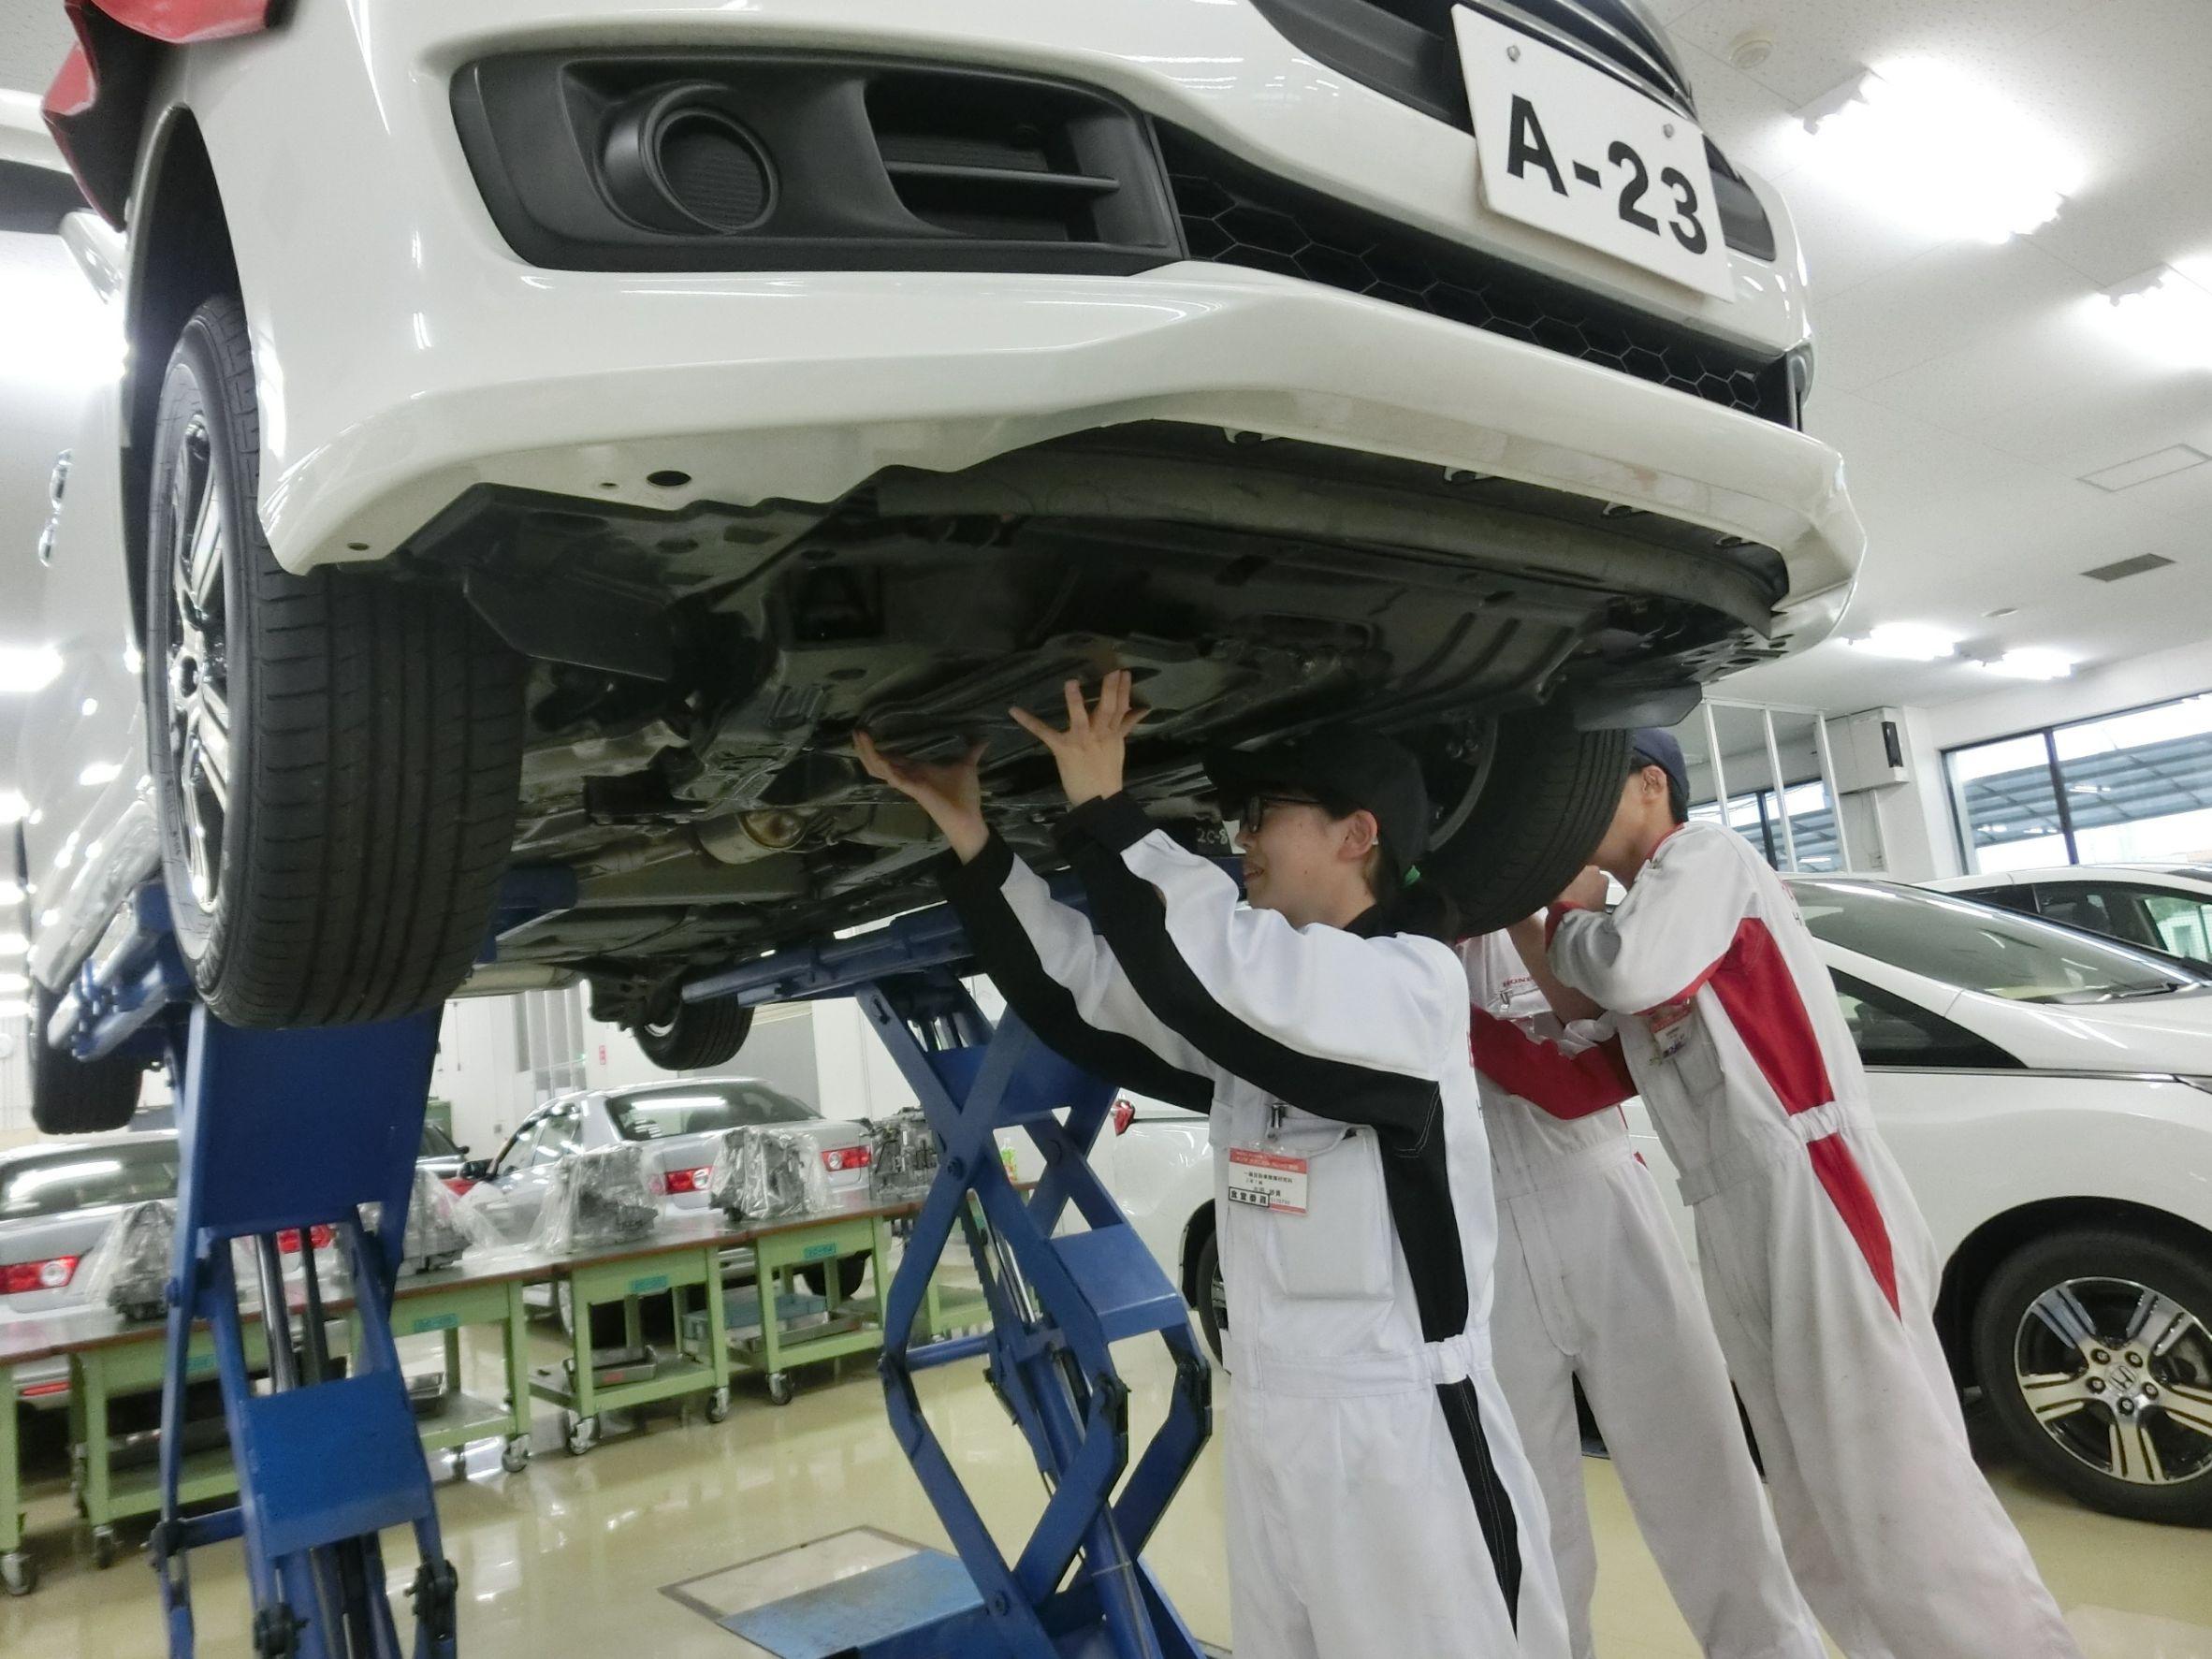 通信制高校卒業後、専門学校で1級自動車整備士を目指す